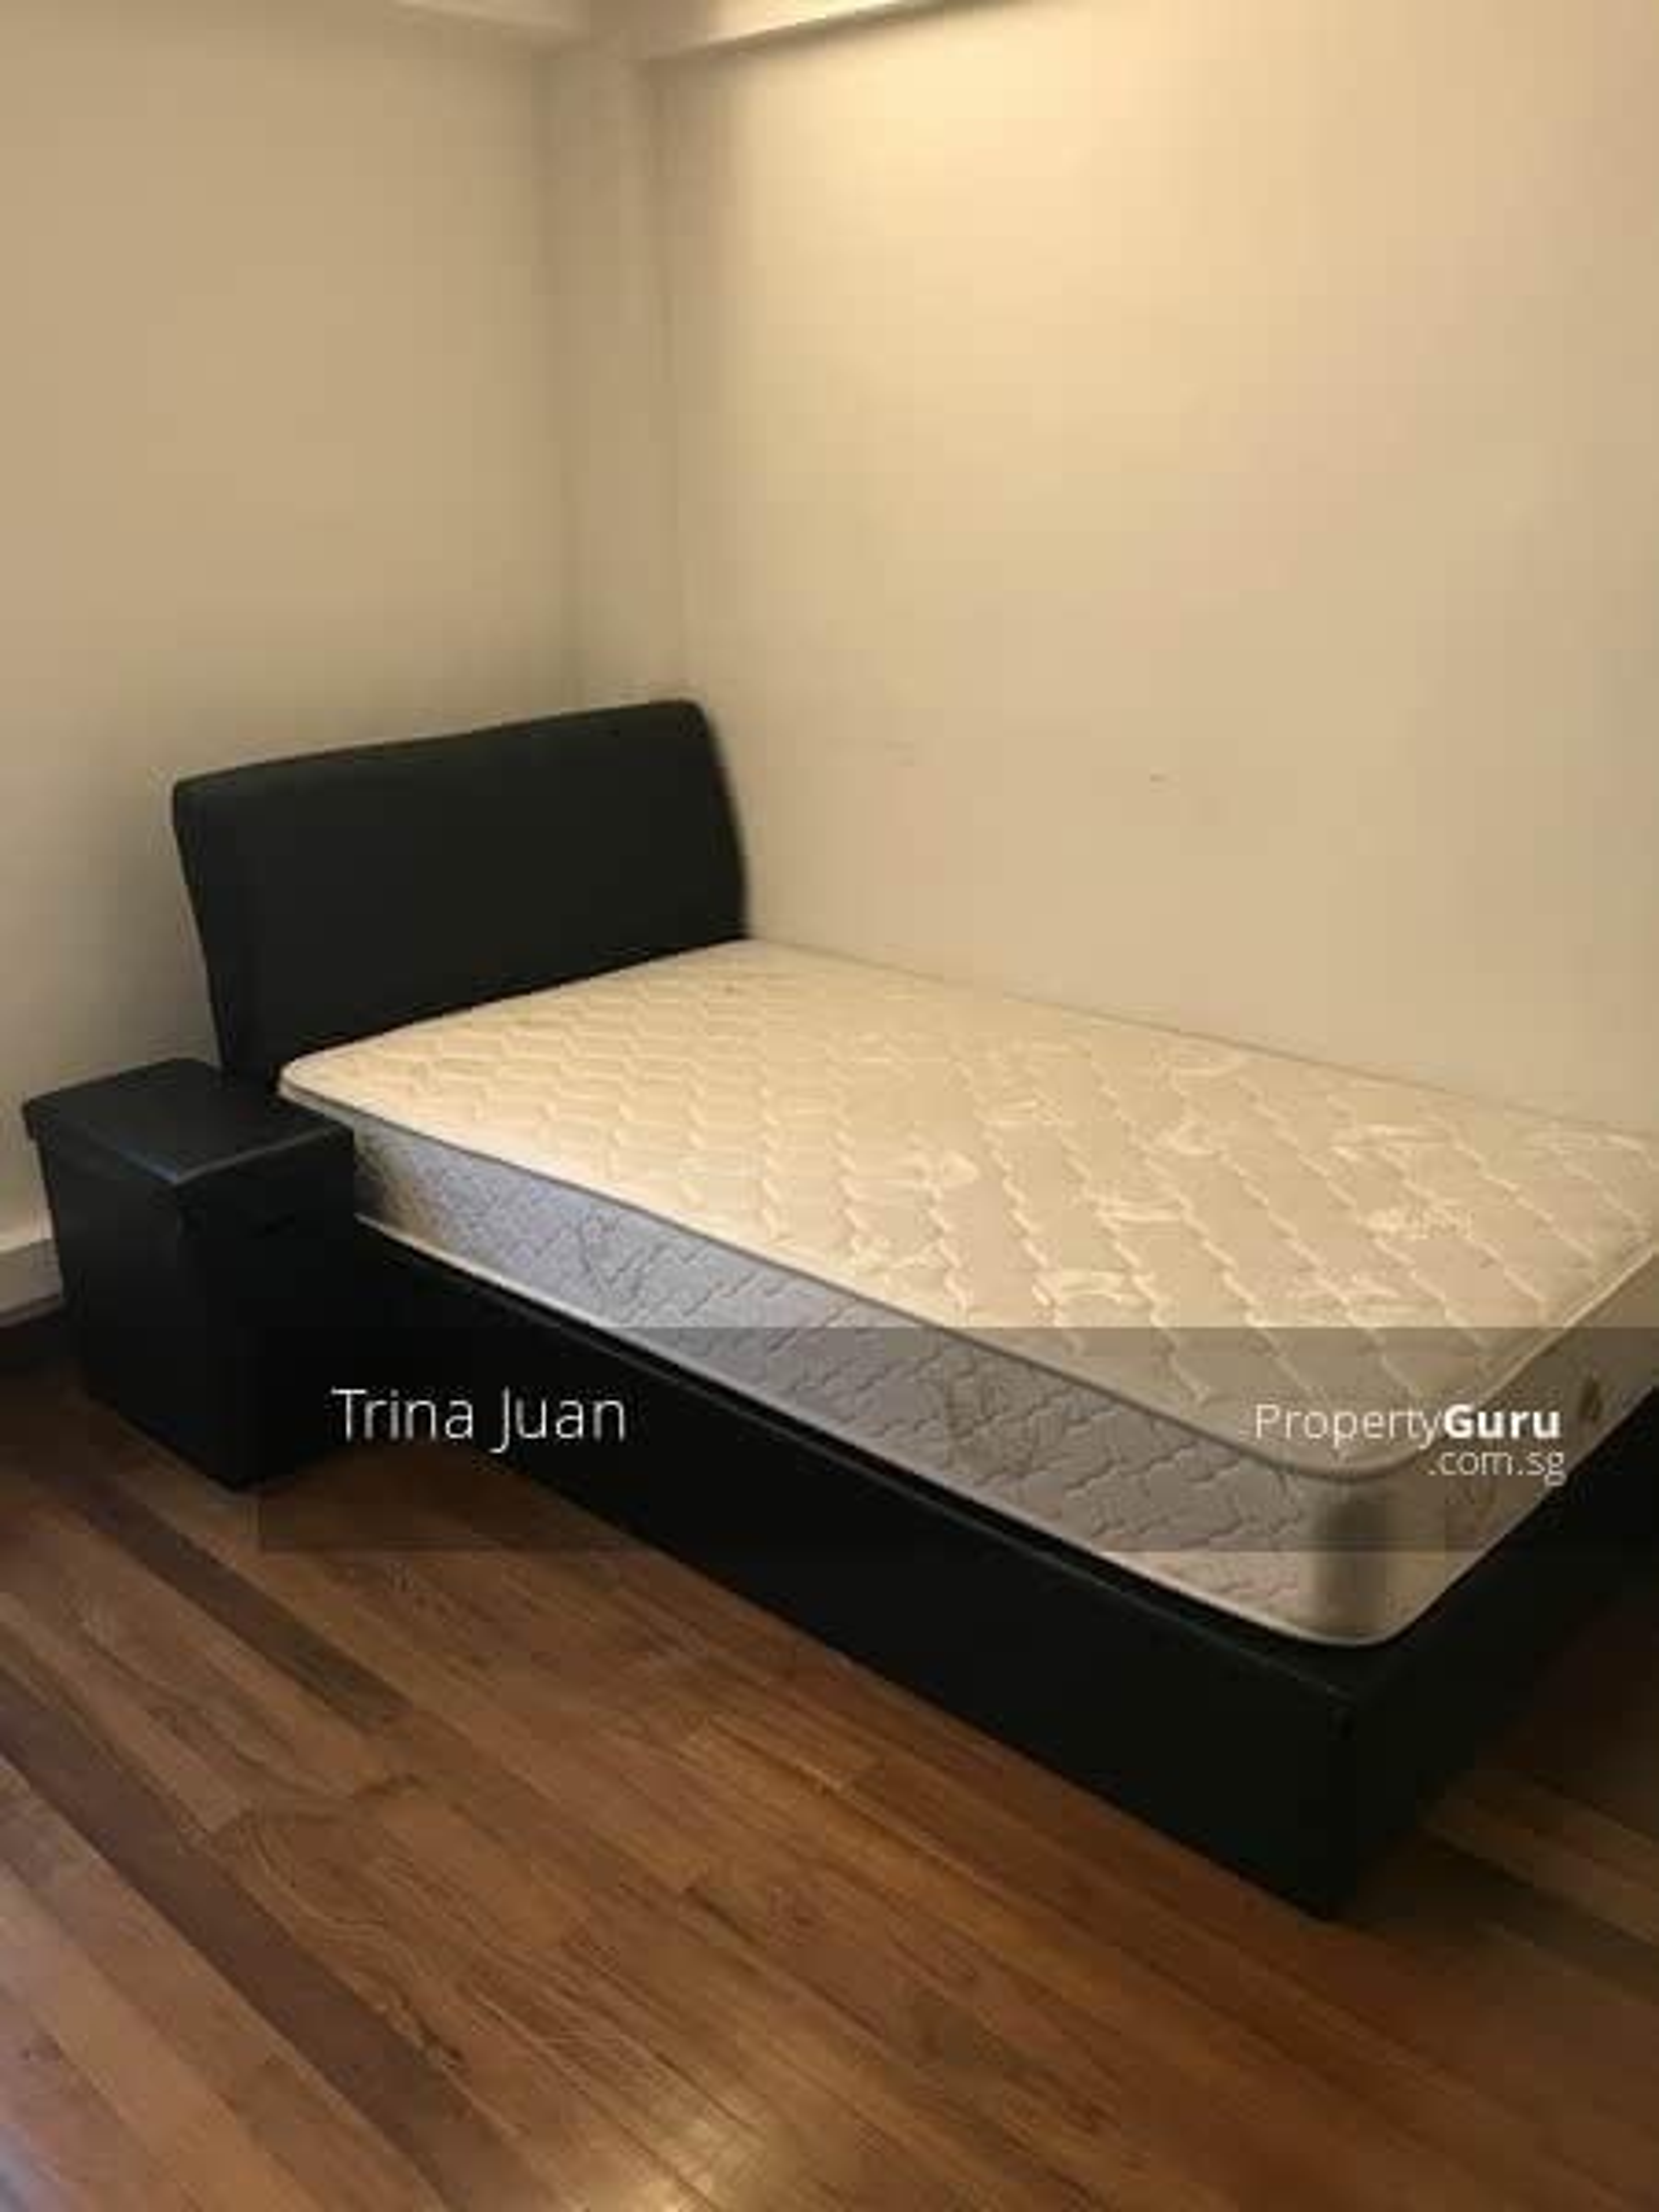 2 Tanjong Pagar Plaza #128727115